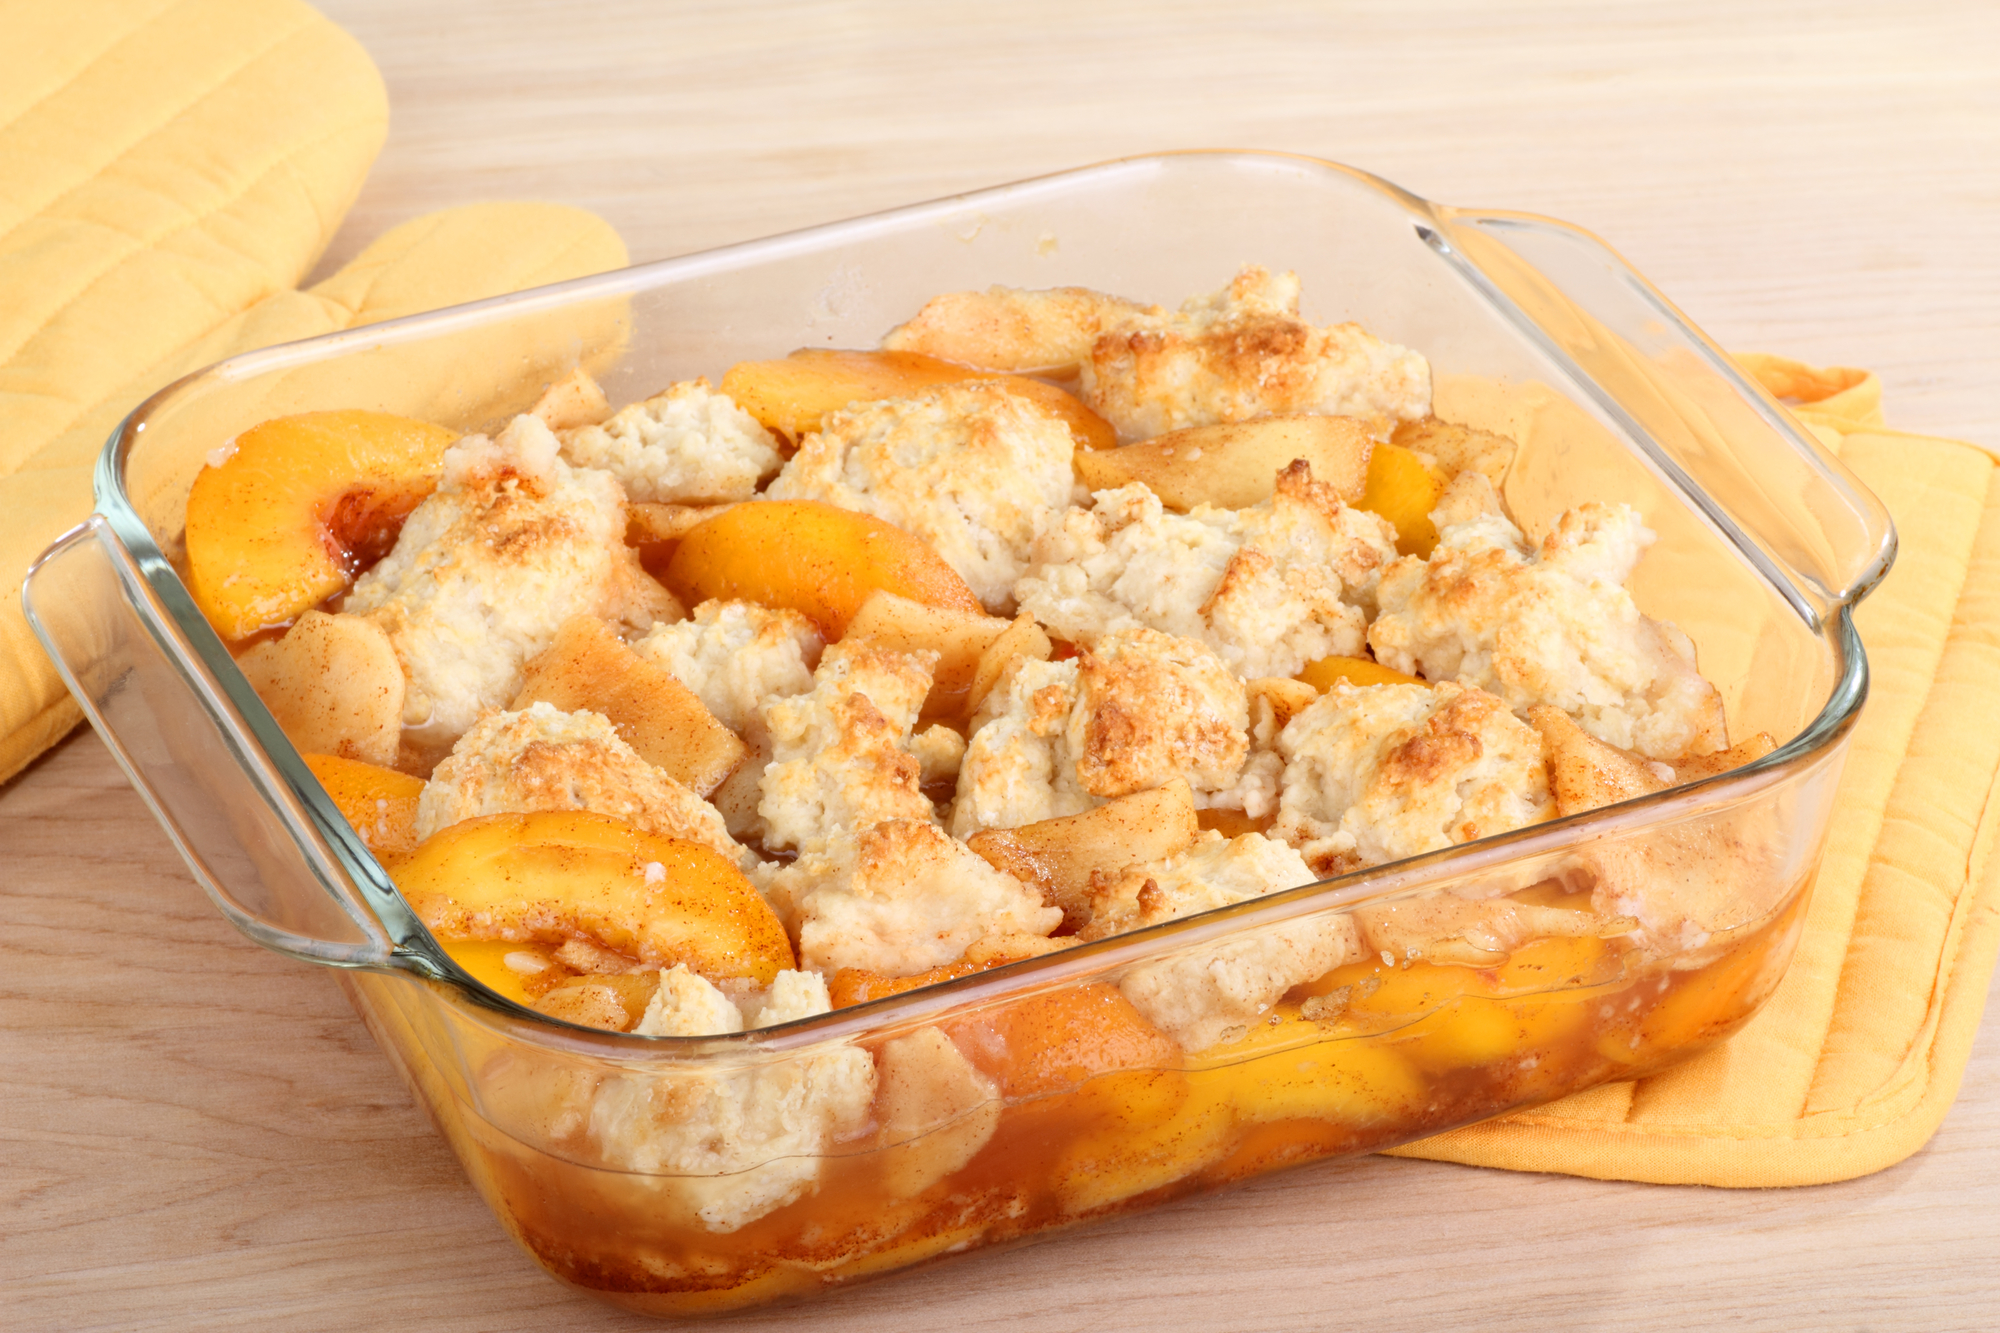 Кухни мира: персиковый коблер по-американски